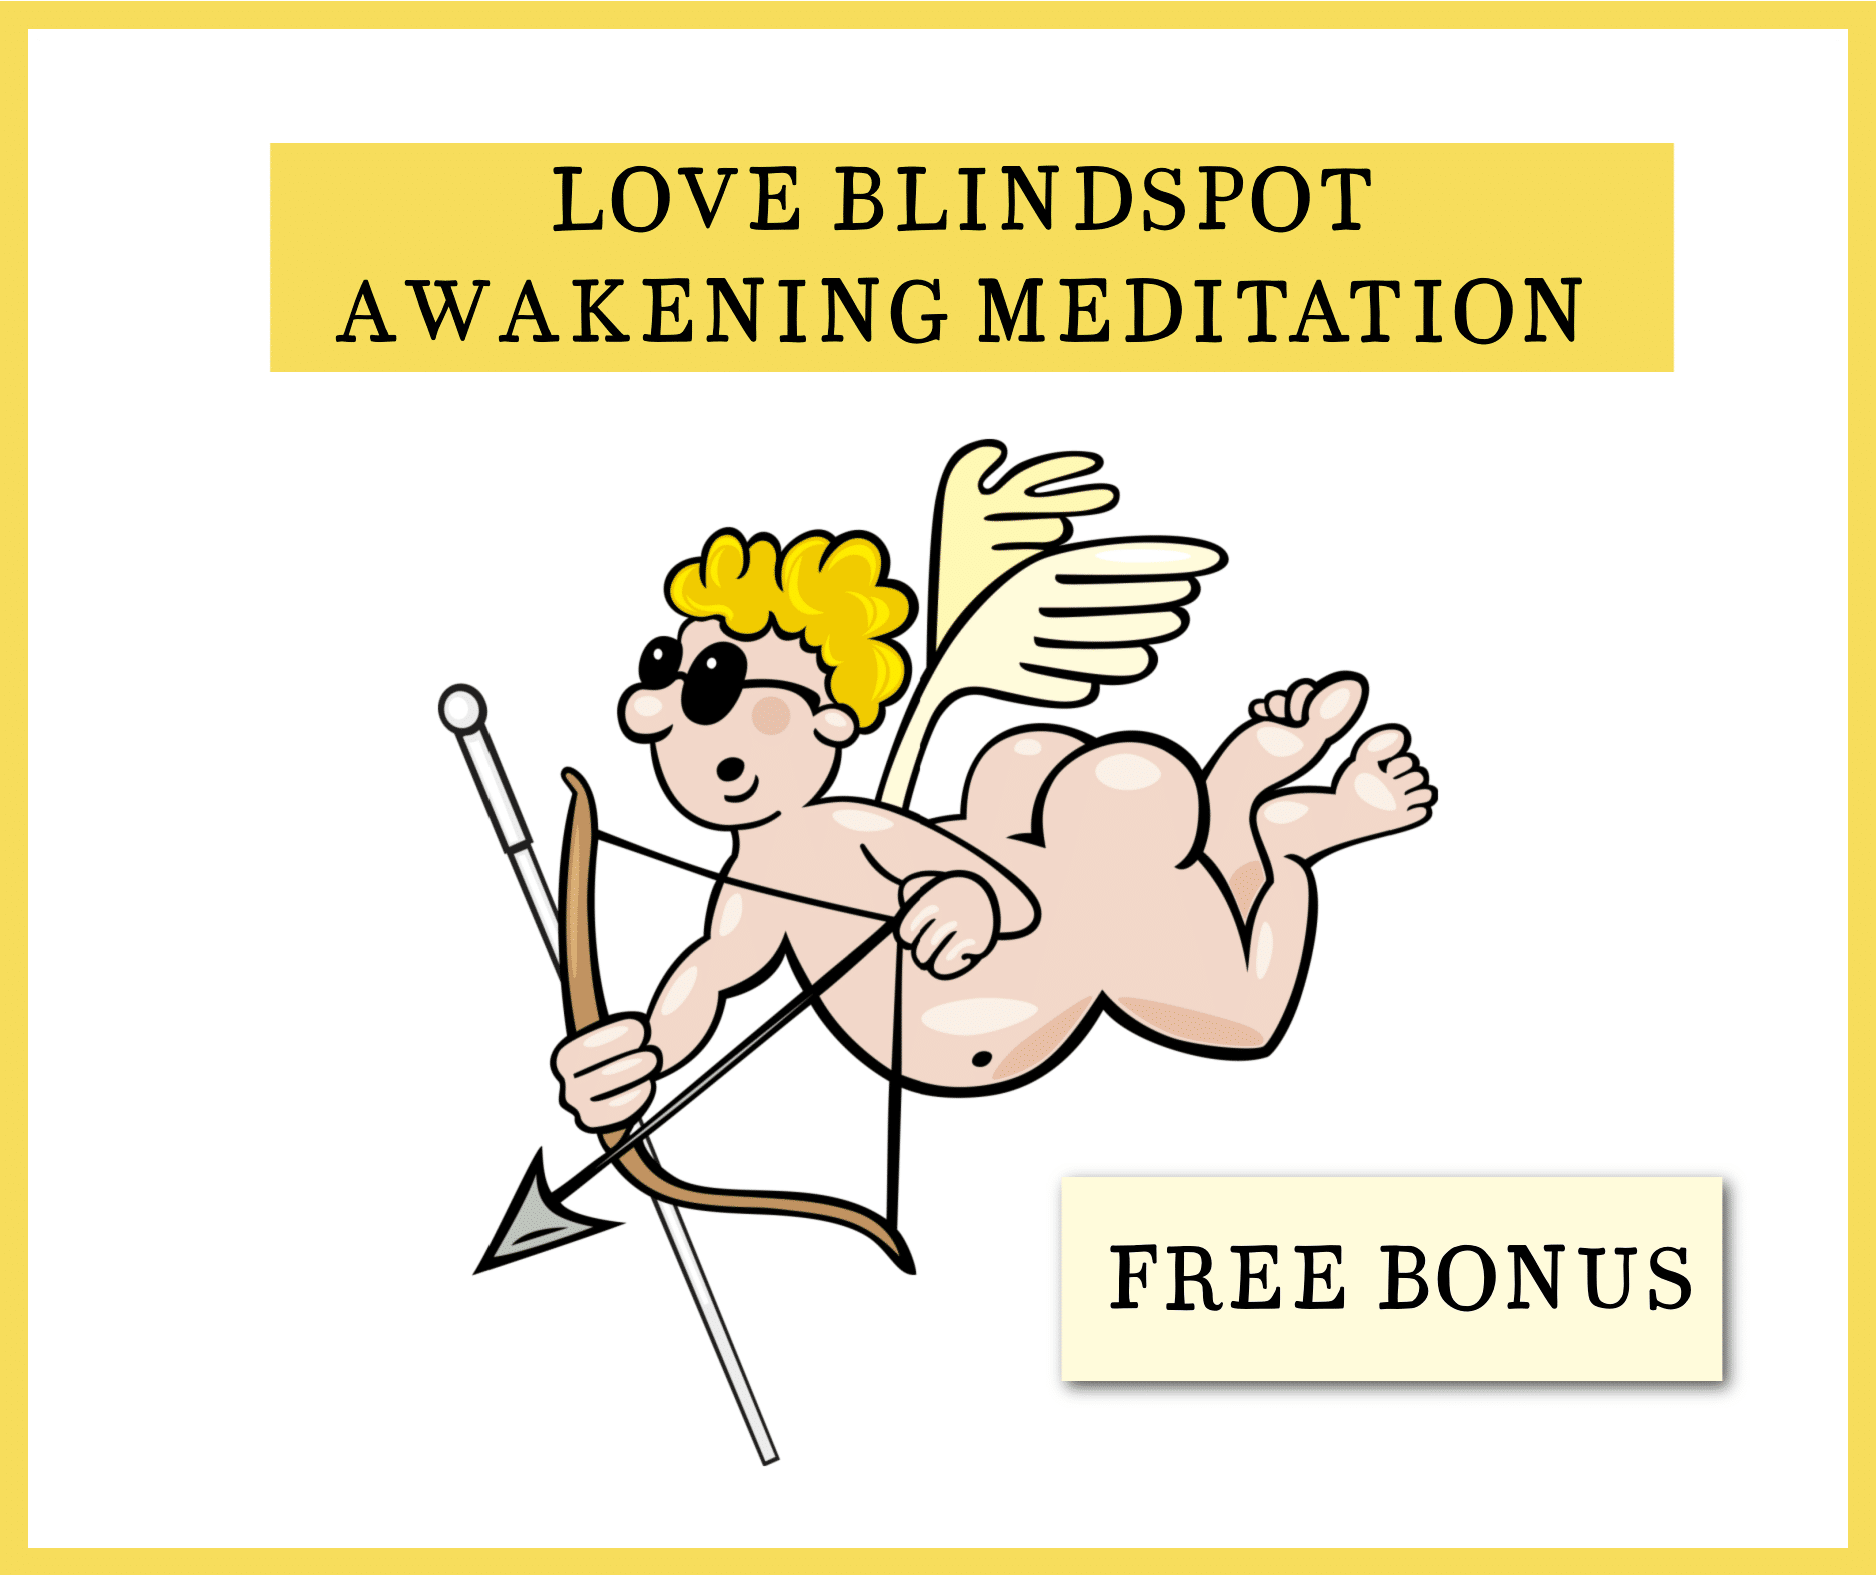 love blindspot awakening meditation